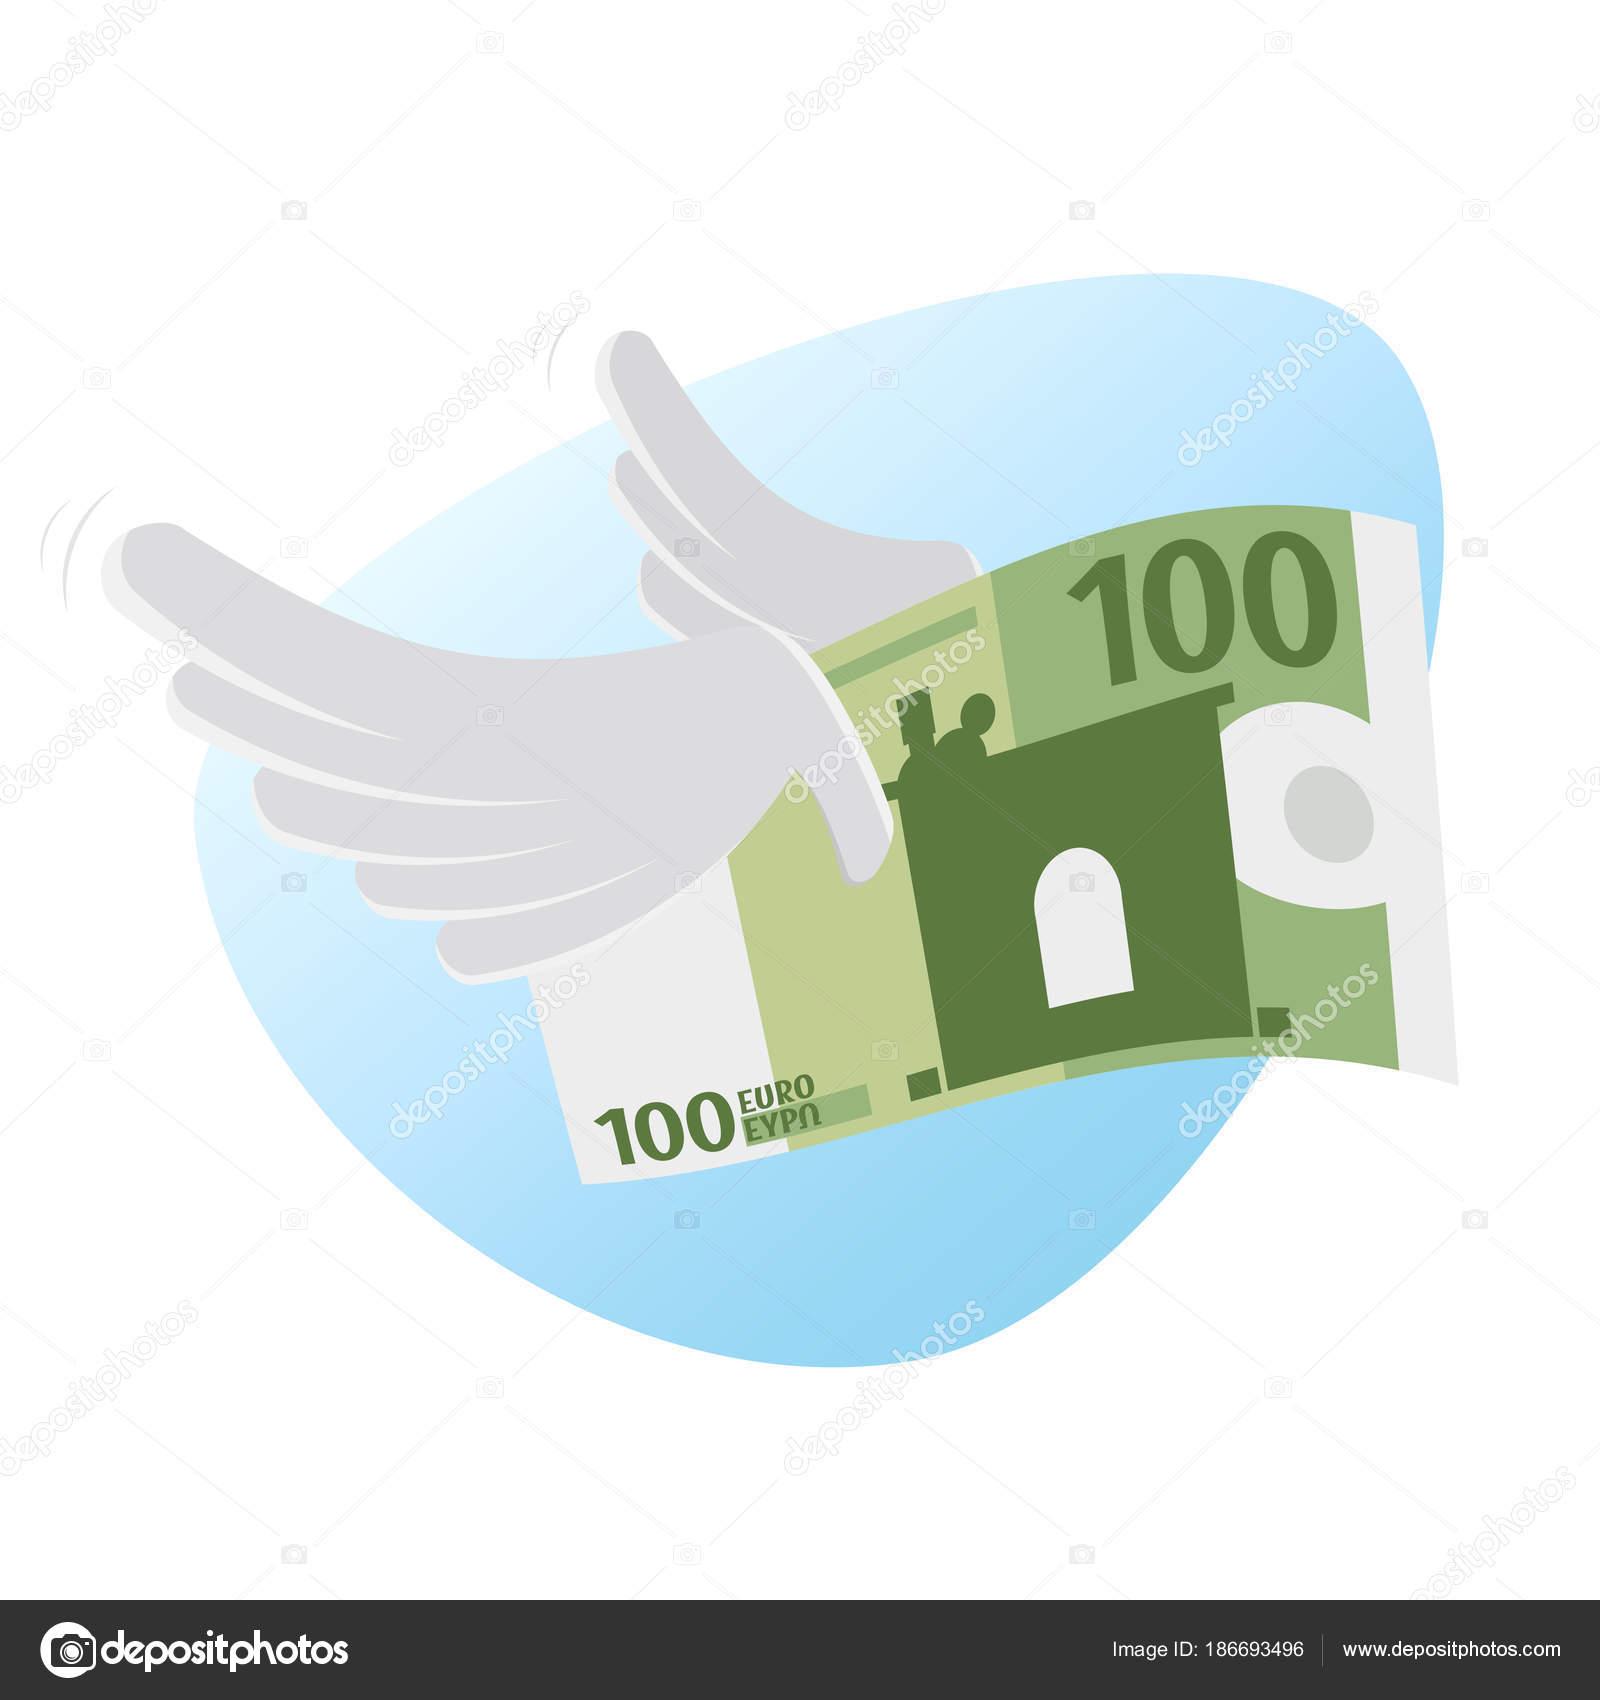 Clipart Euro Bank Note Wings — Stock Vector © shockfactor.de #186693496.